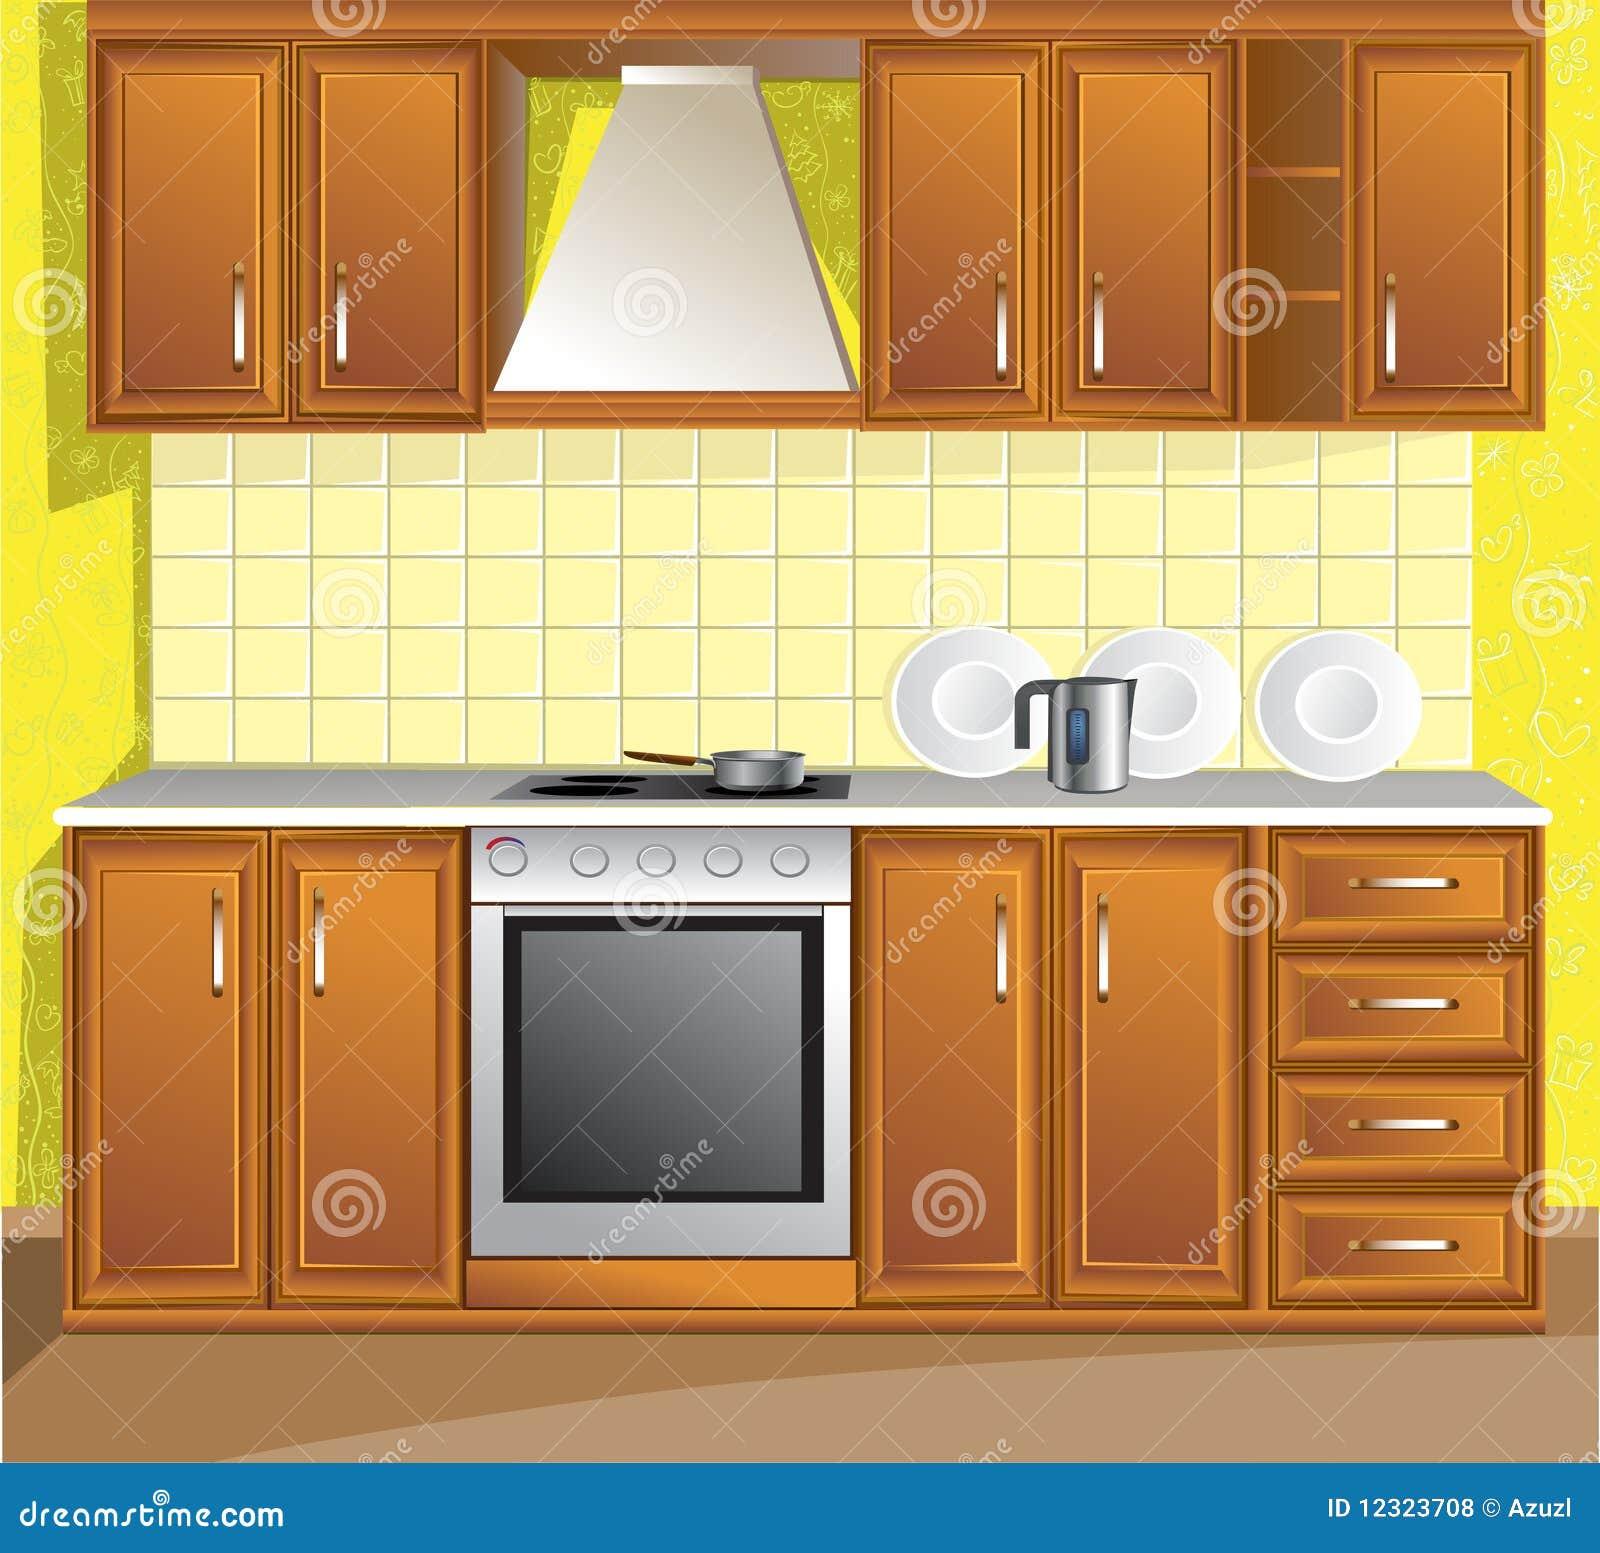 Light Kitchen Room Royalty Free Stock Photos - Image: 12323708